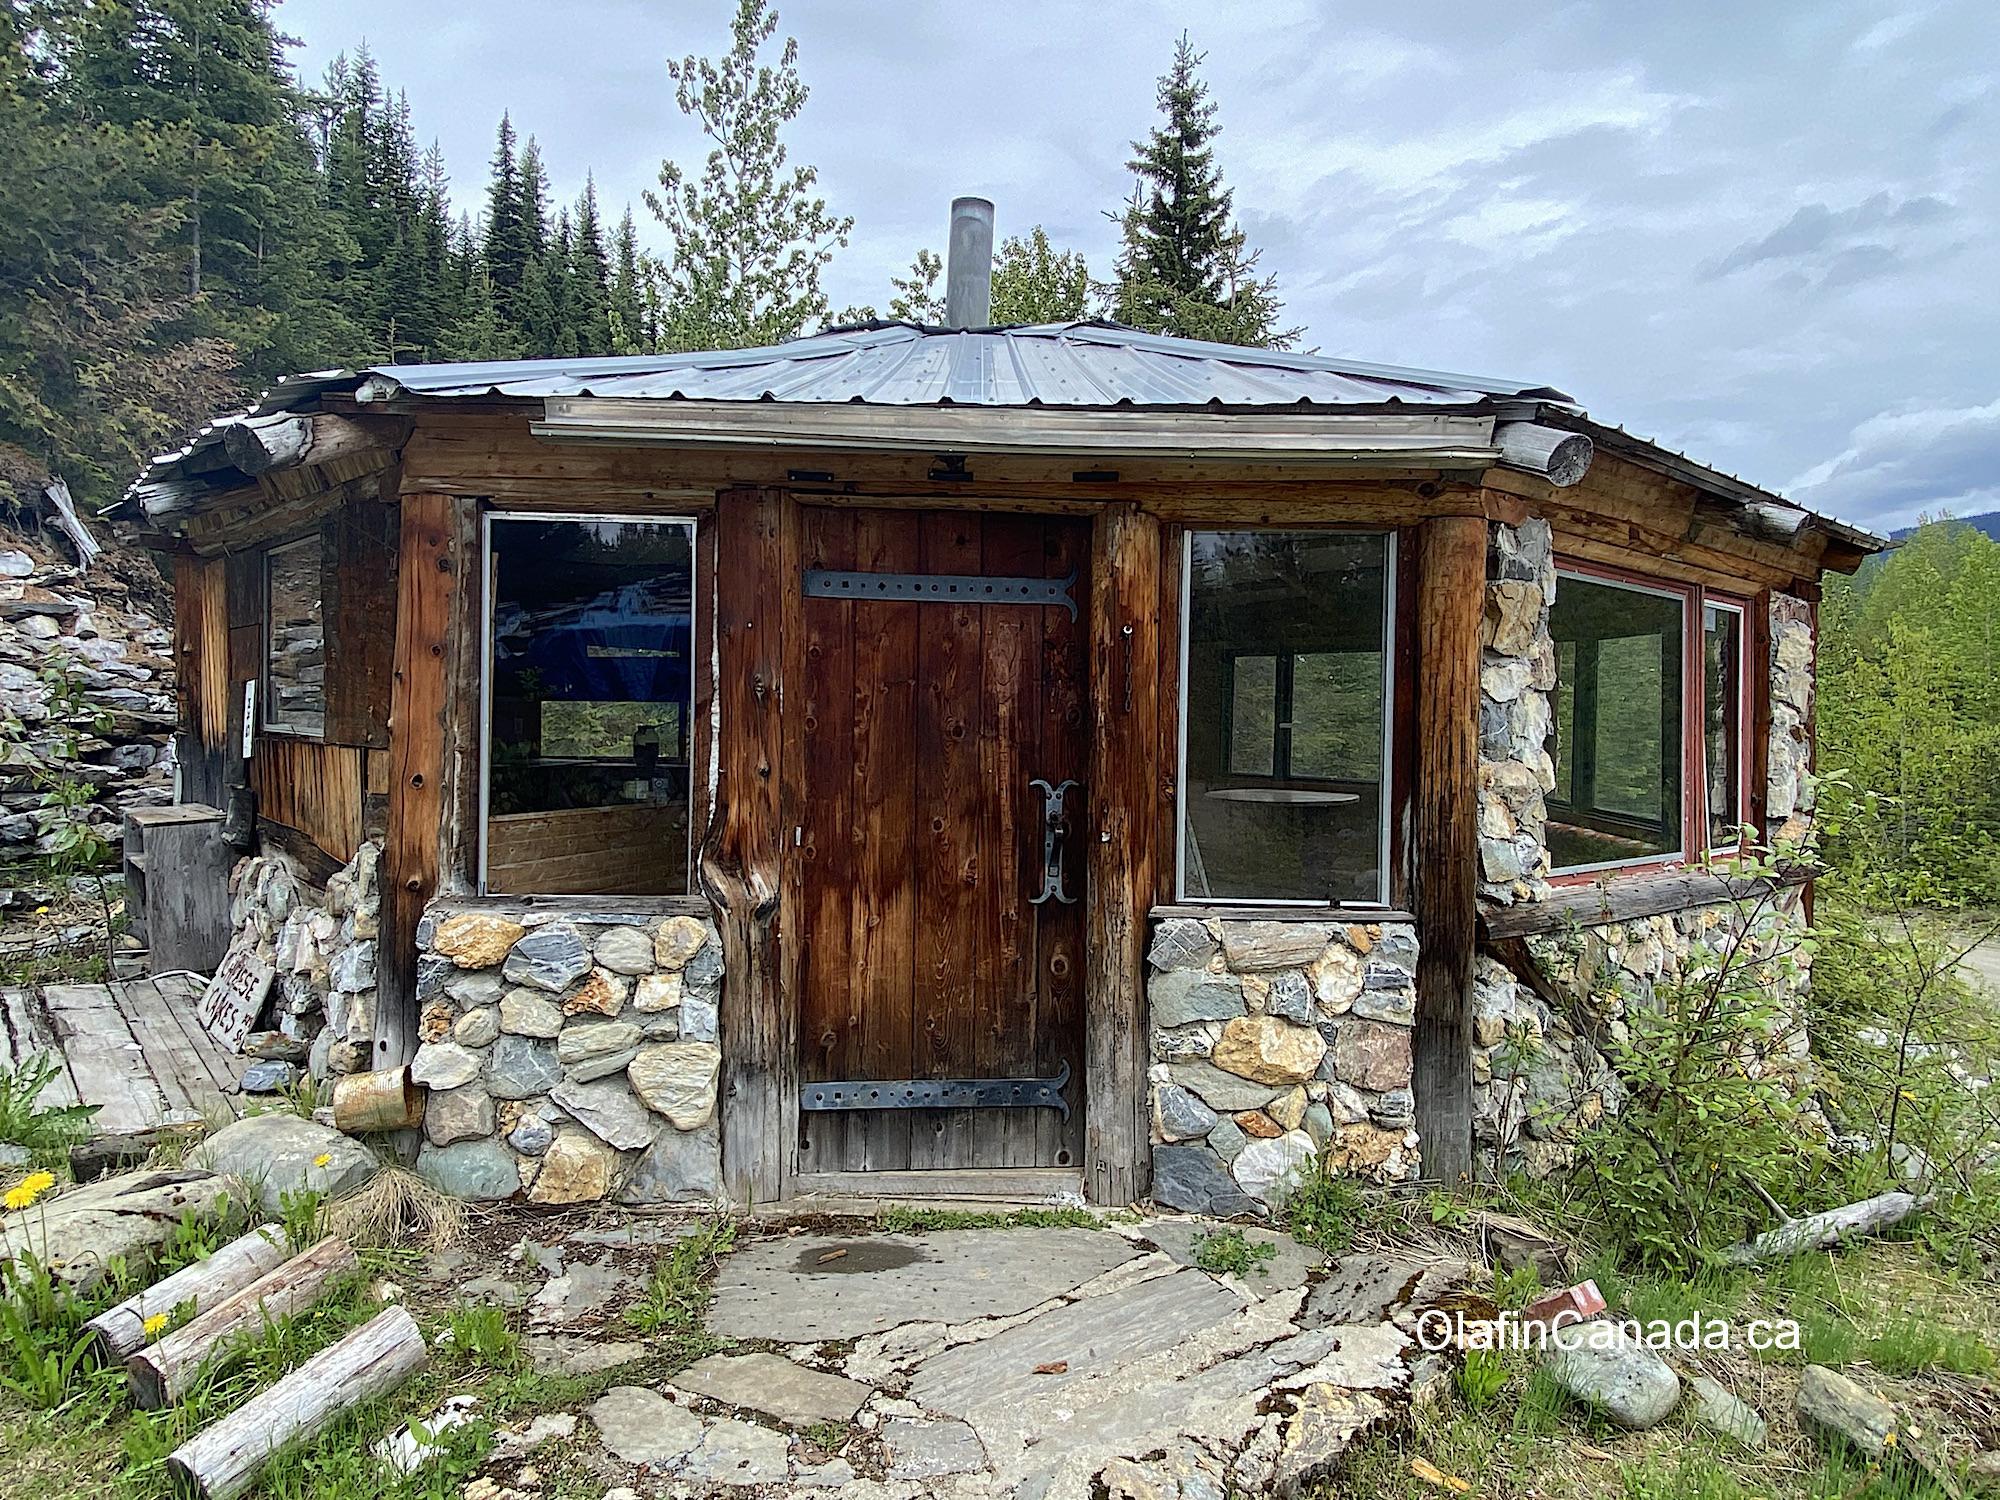 Abandoned cabin at Comet Creek Resort in the Cariboo between Likely and Barkerville #olafincanada #britishcolumbia #discoverbc #abandonedbc #cariboo #cometcreekresort